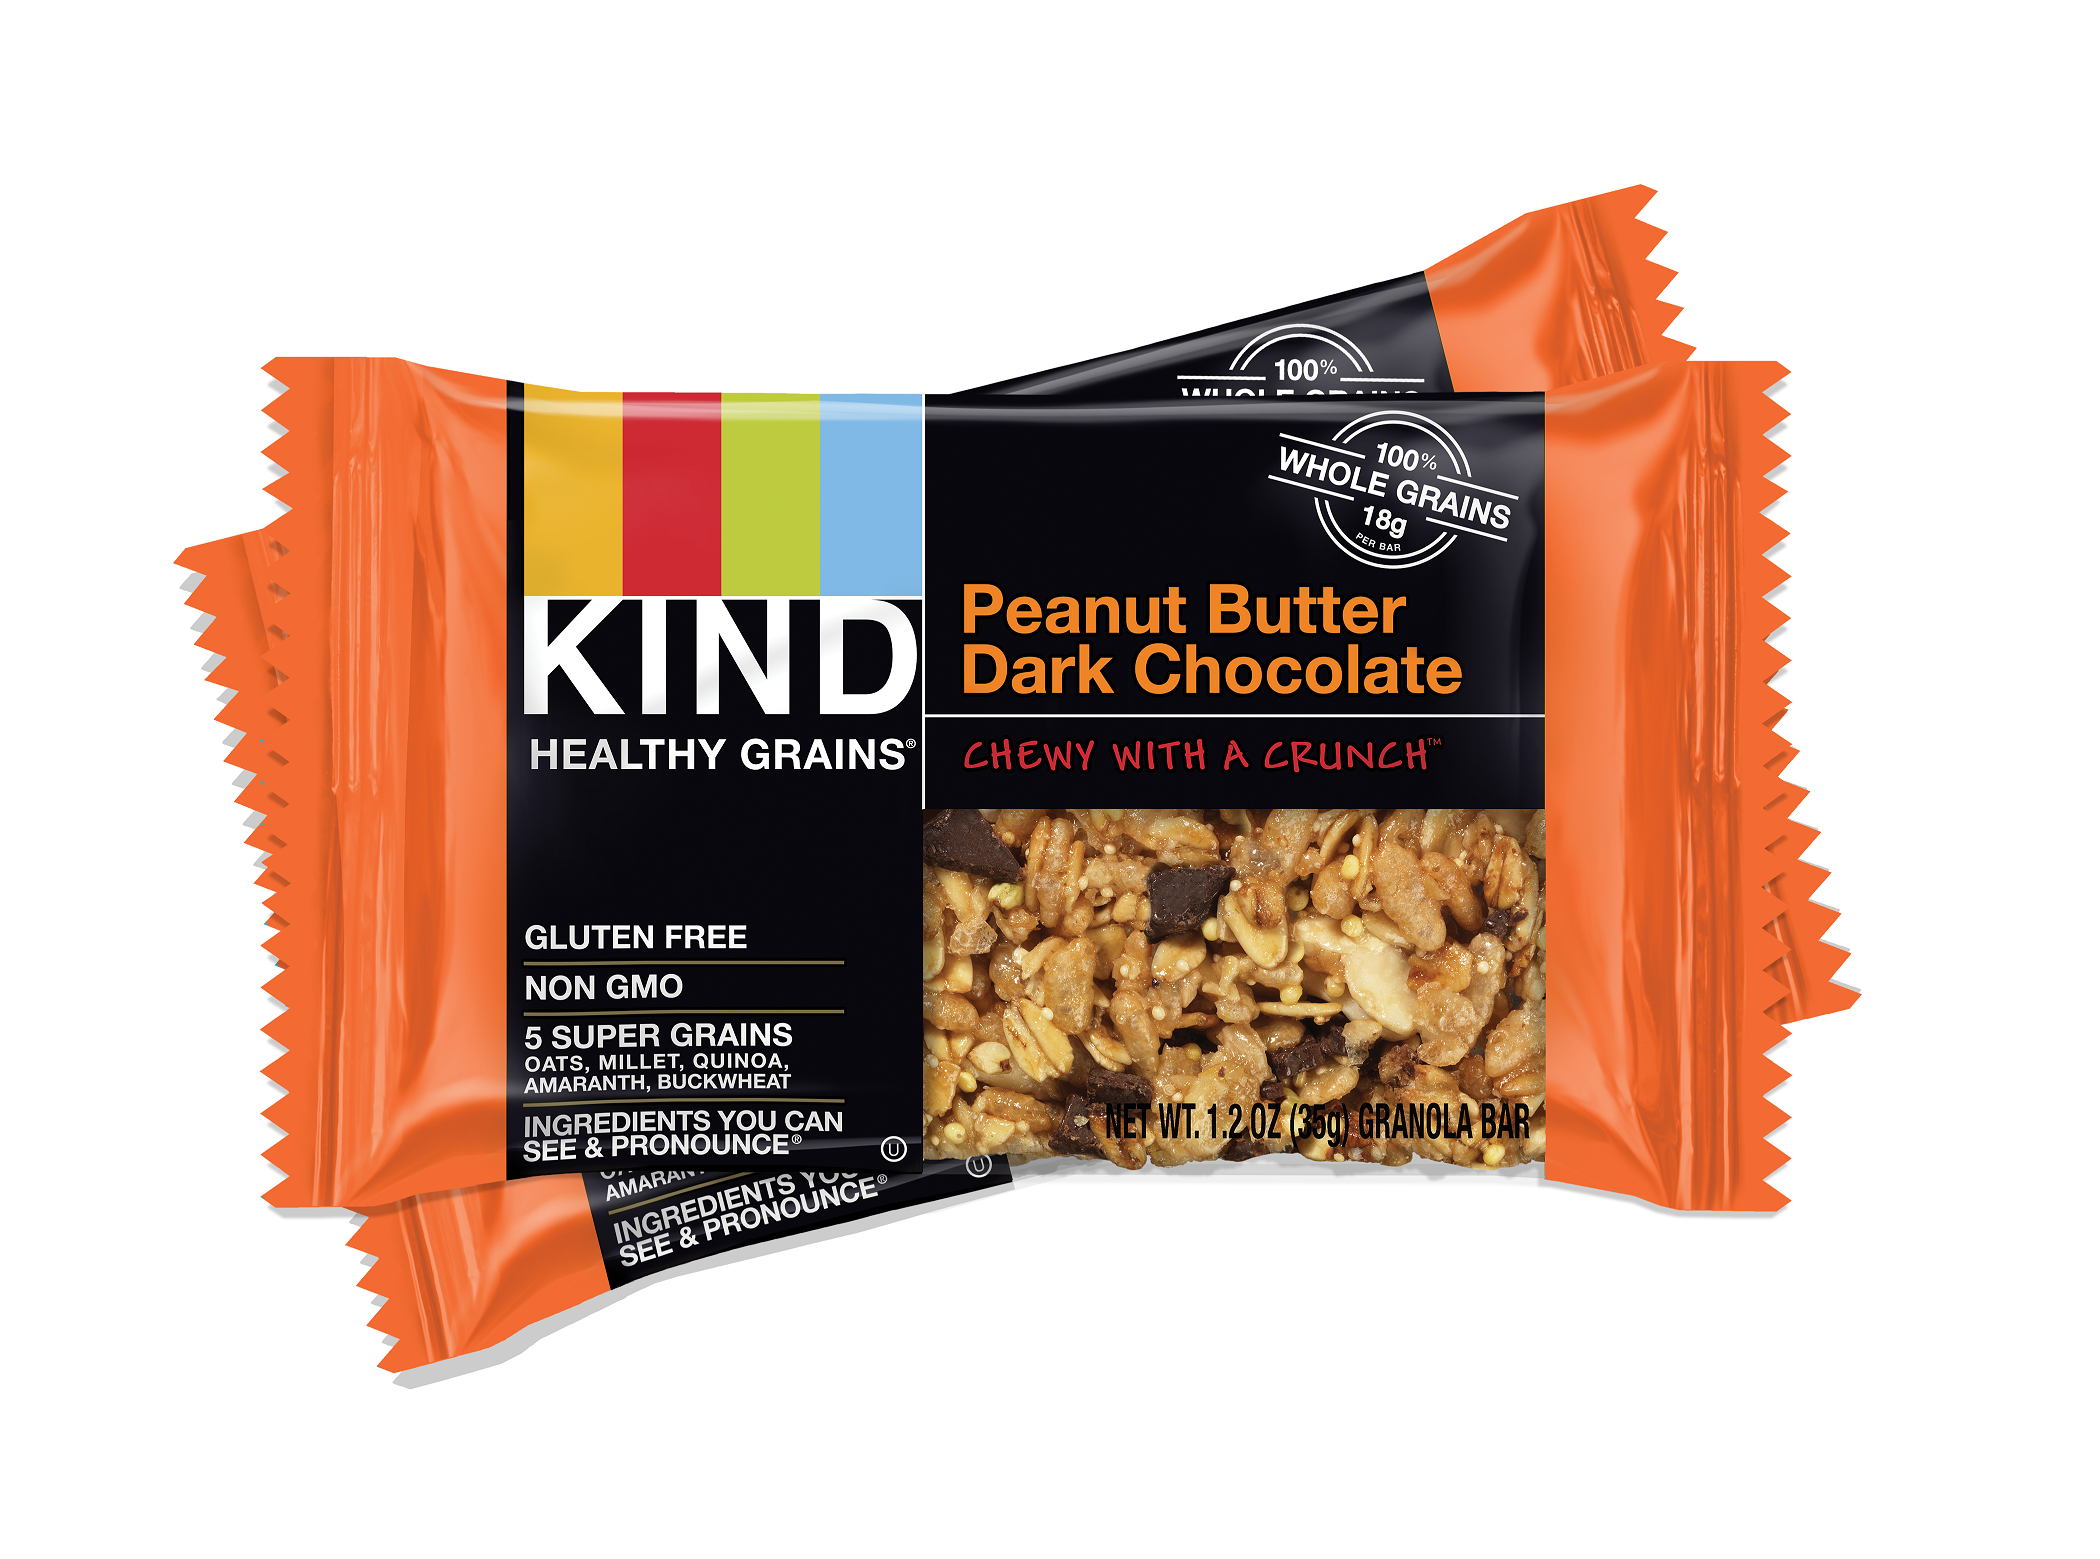 Kind chocolate